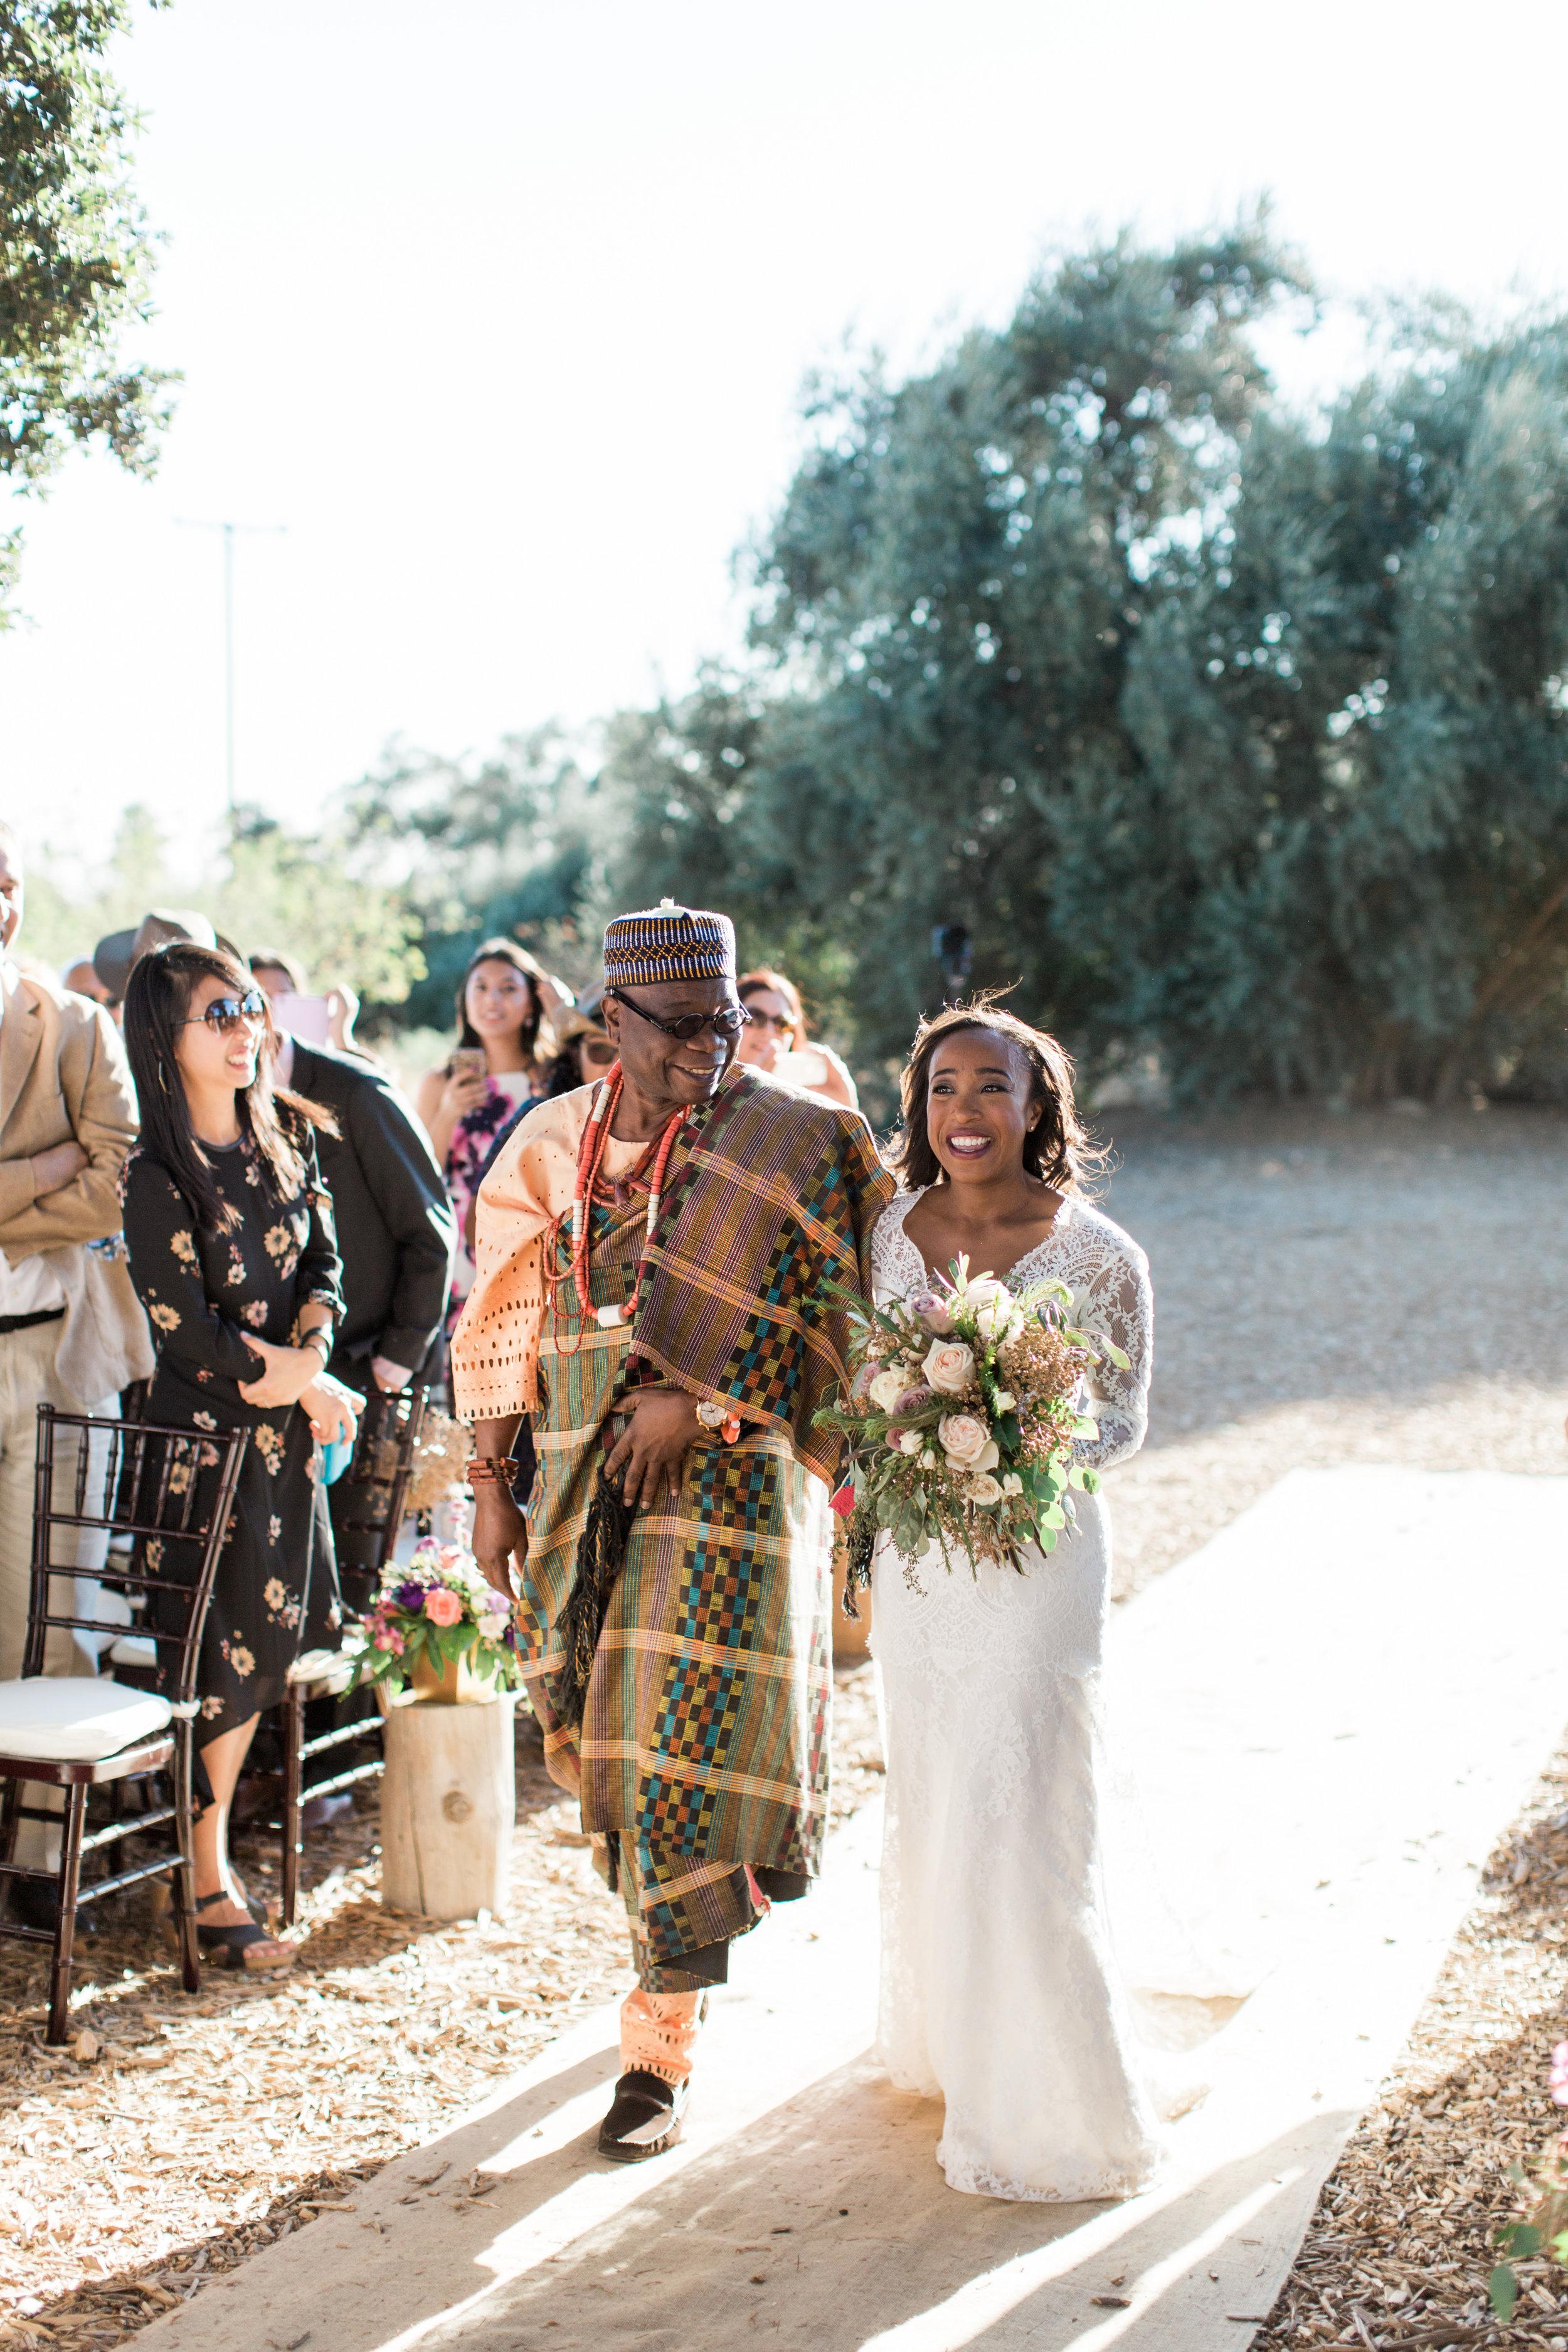 Jenny Quicksall Photography_www.jennyquicksall.com_California Wedding Photographer_Highland Springs Ranch and Inn Resort_Cherry Valley California (39).JPG